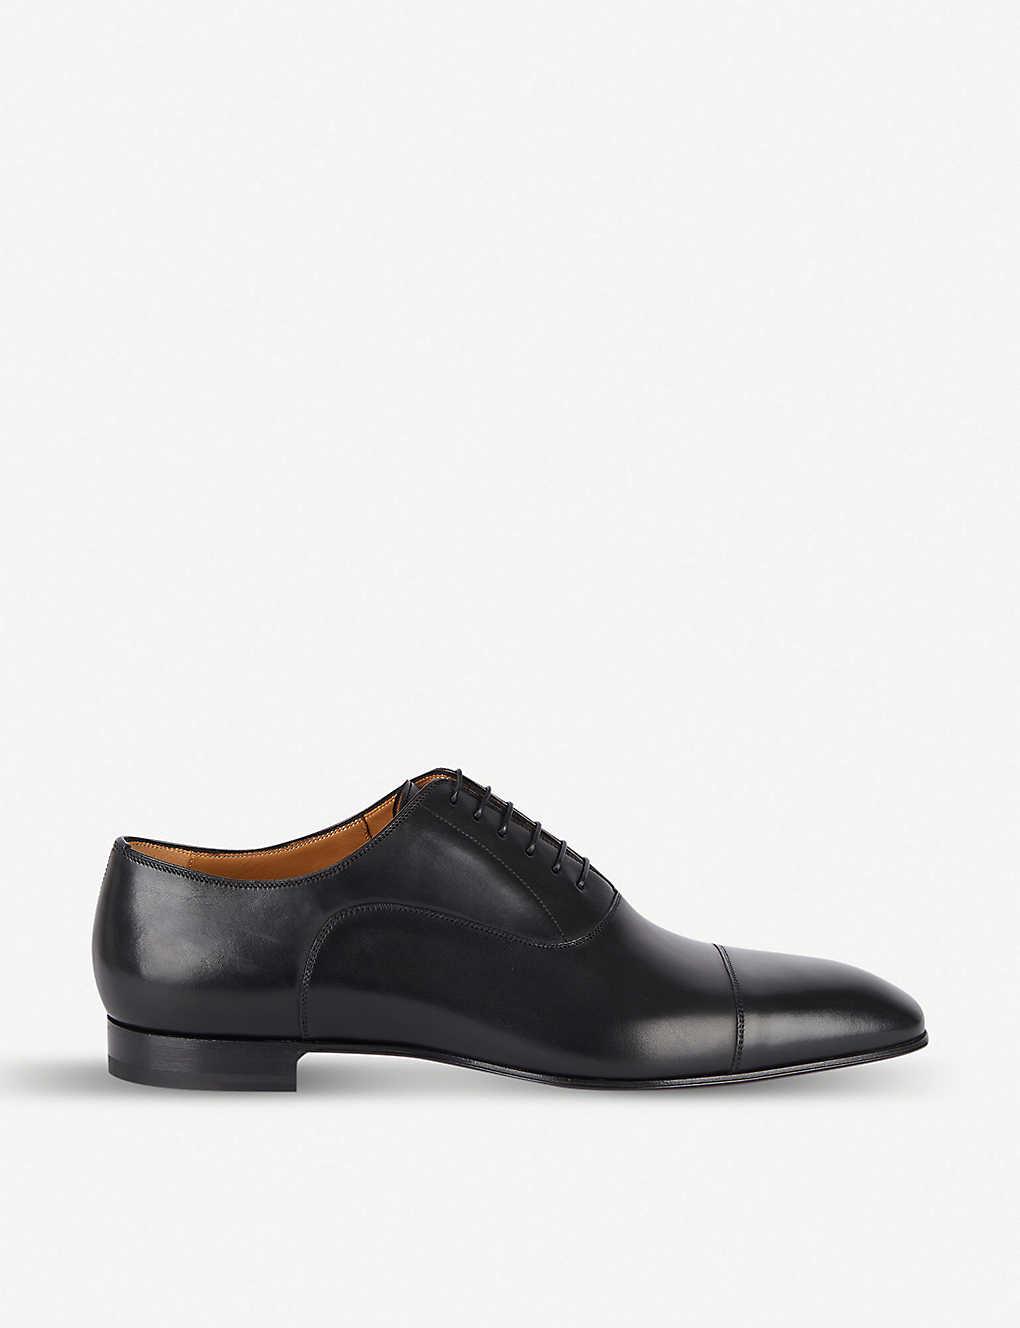 outlet store db8d9 6f932 CHRISTIAN LOUBOUTIN - Greggo flat calf p black | Selfridges.com